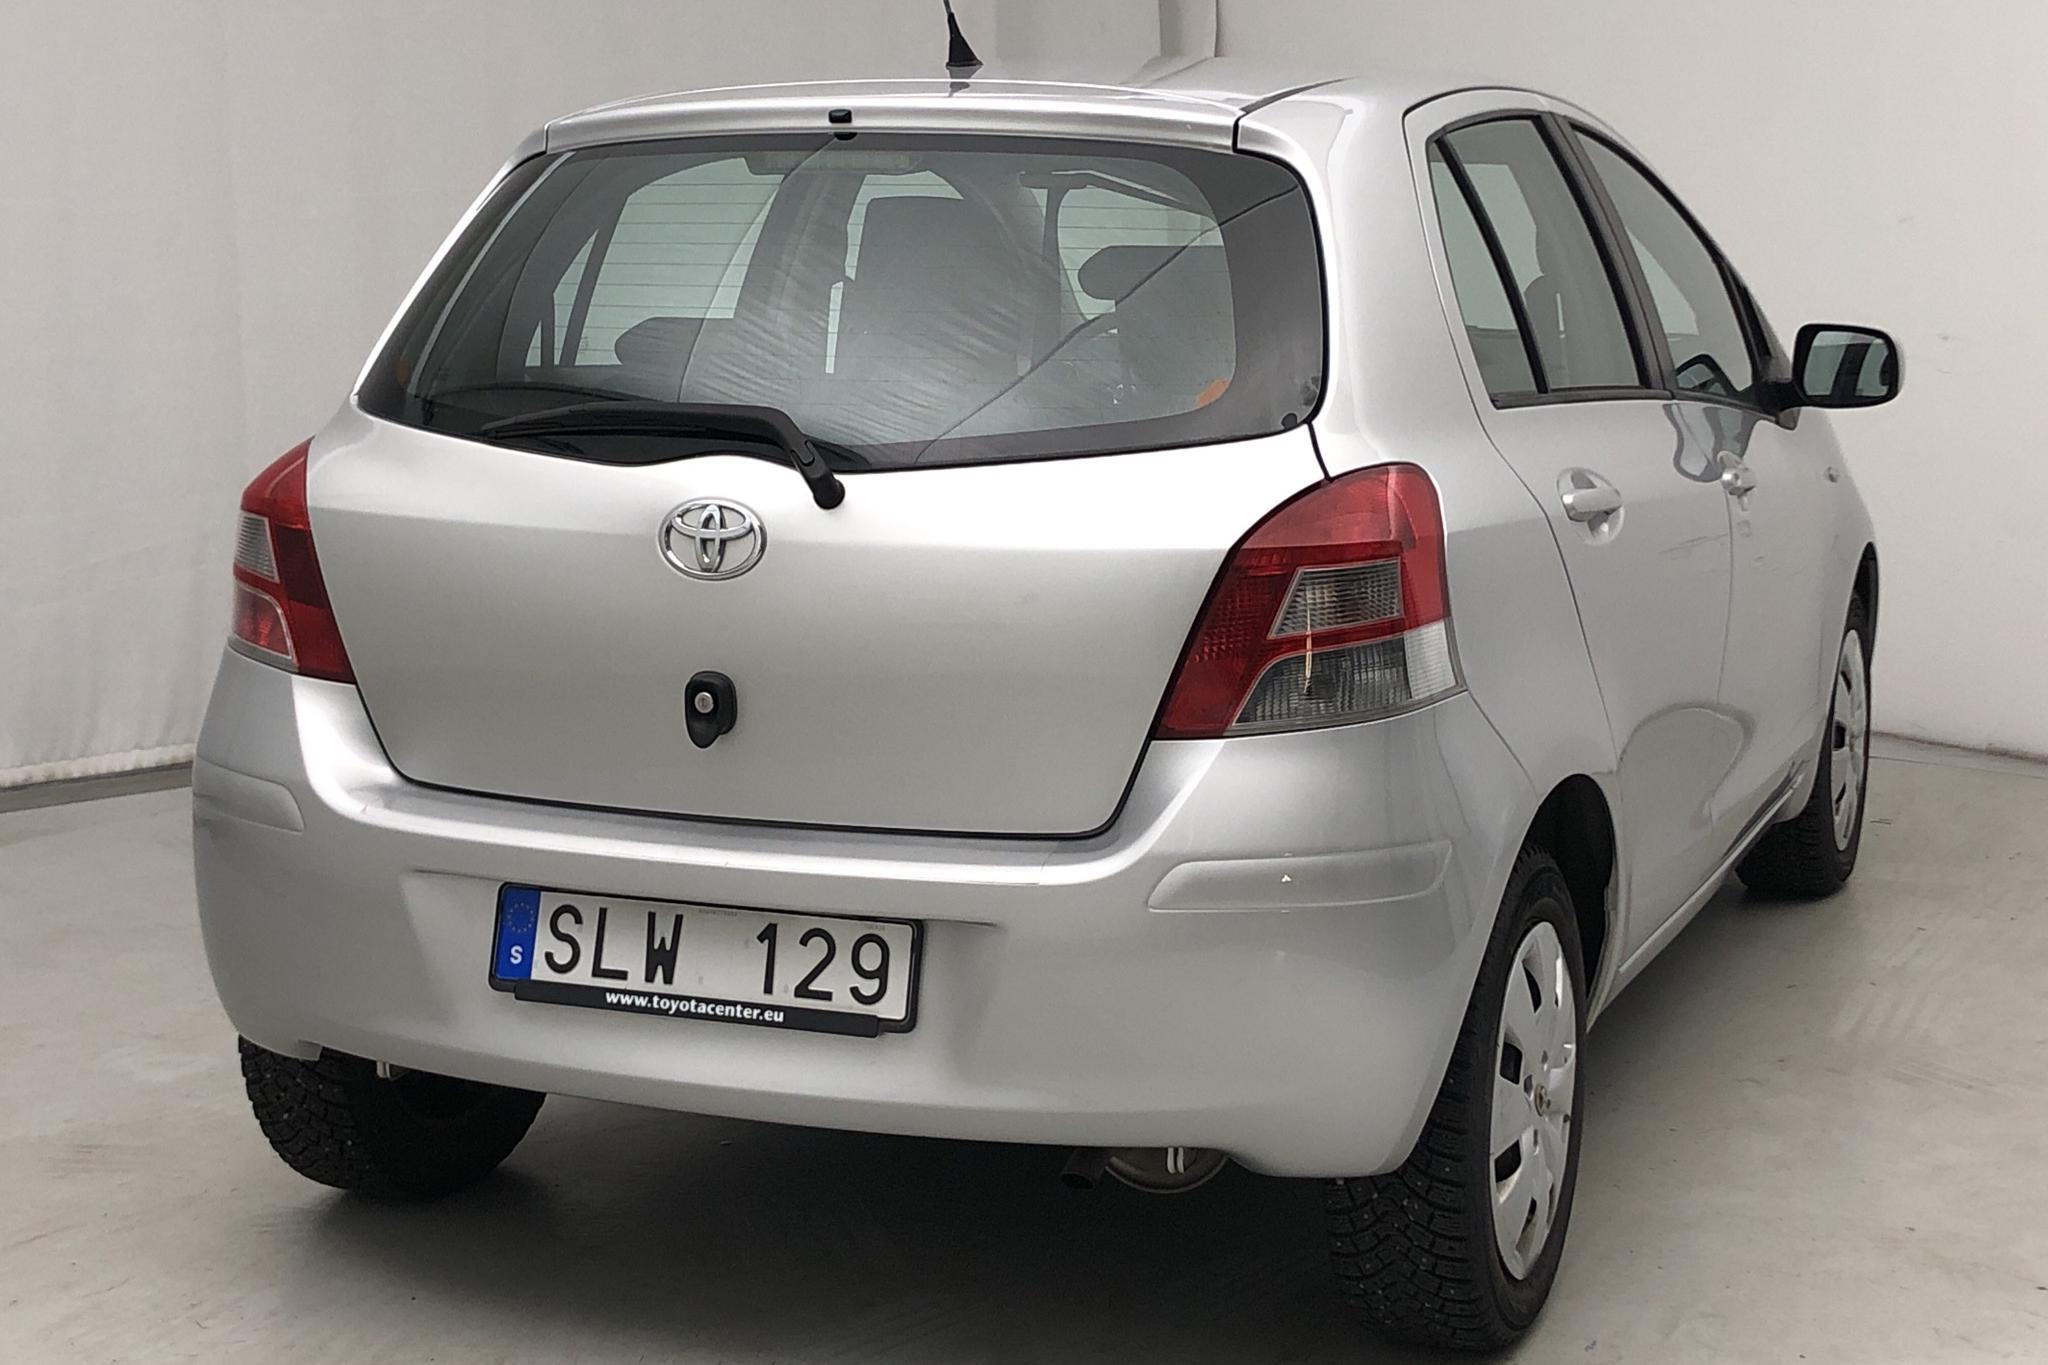 Toyota Yaris 1.0 5dr (69hk) - 99 340 km - Manual - silver - 2010